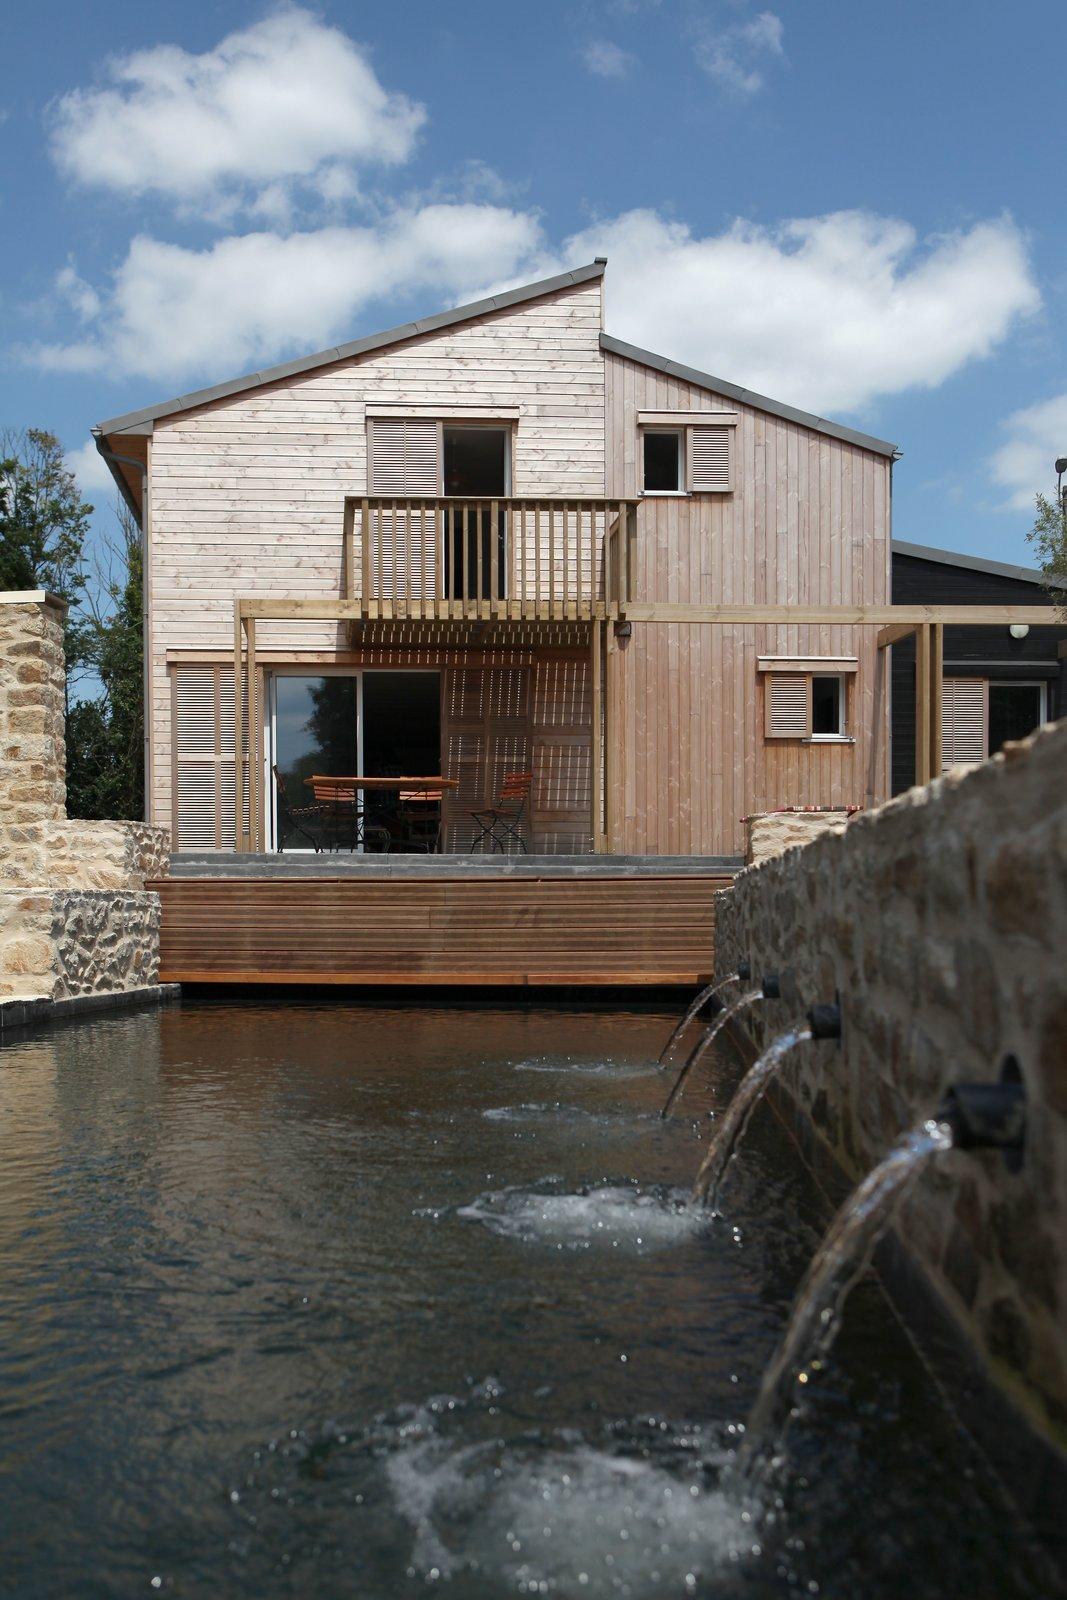 A bioclimatic house in Auray, Brittany , France Patrice Bideau  A bioclimatic house in Auray, Brittany, France by a.typique Patrice Bideau ( 2013 ) by Patrice Bideau